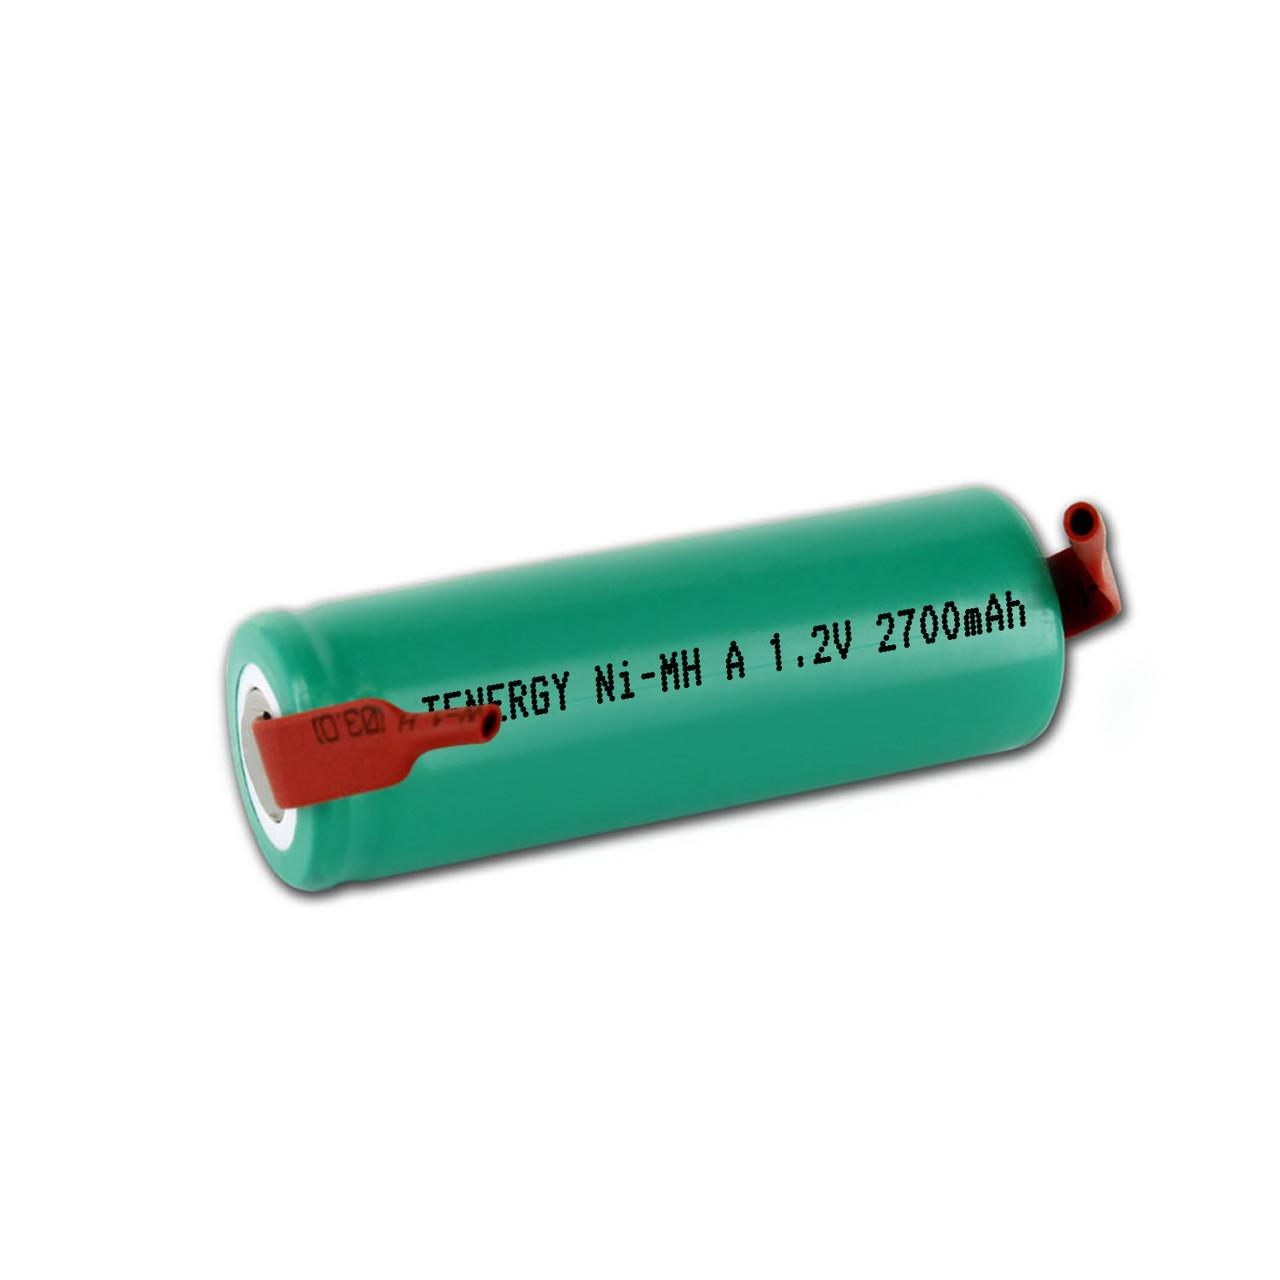 Tenergy A Size NiMH 2700mAh Rechargeable Batteries